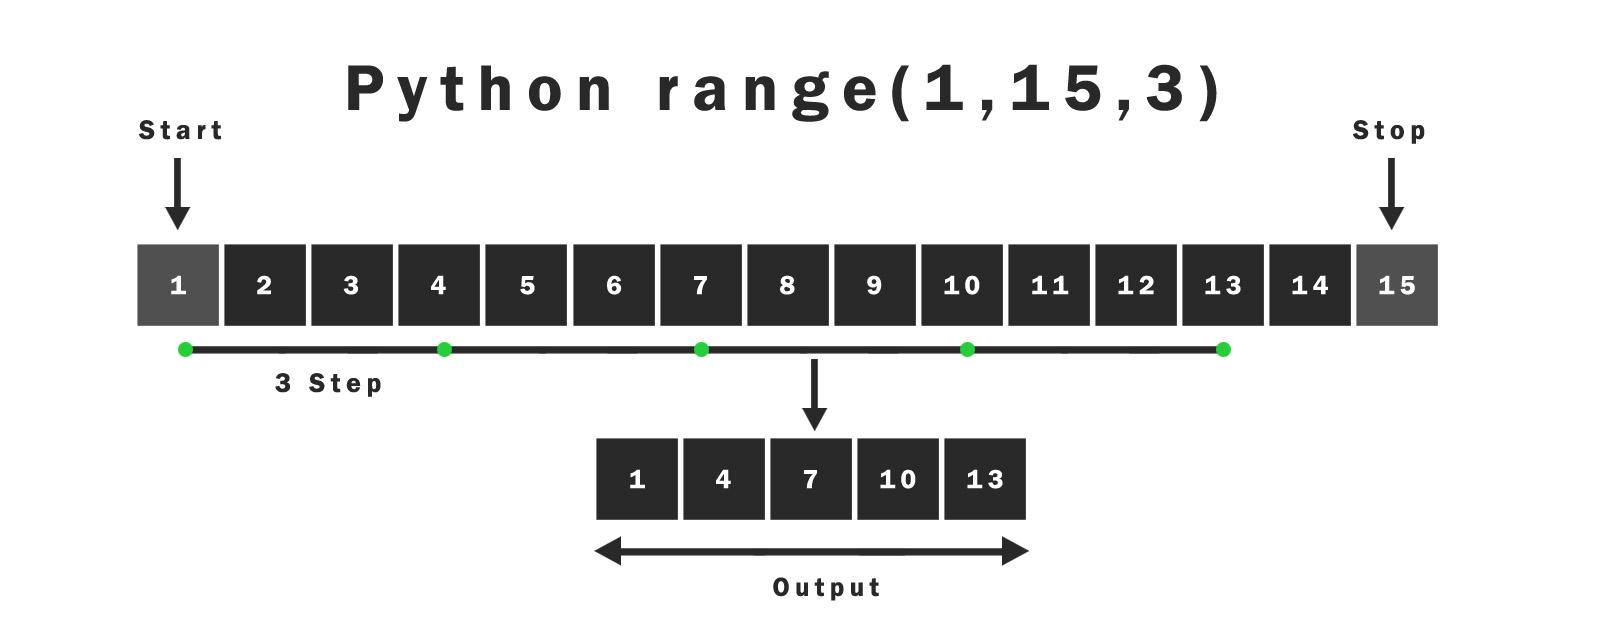 Python range(start, stop, step)